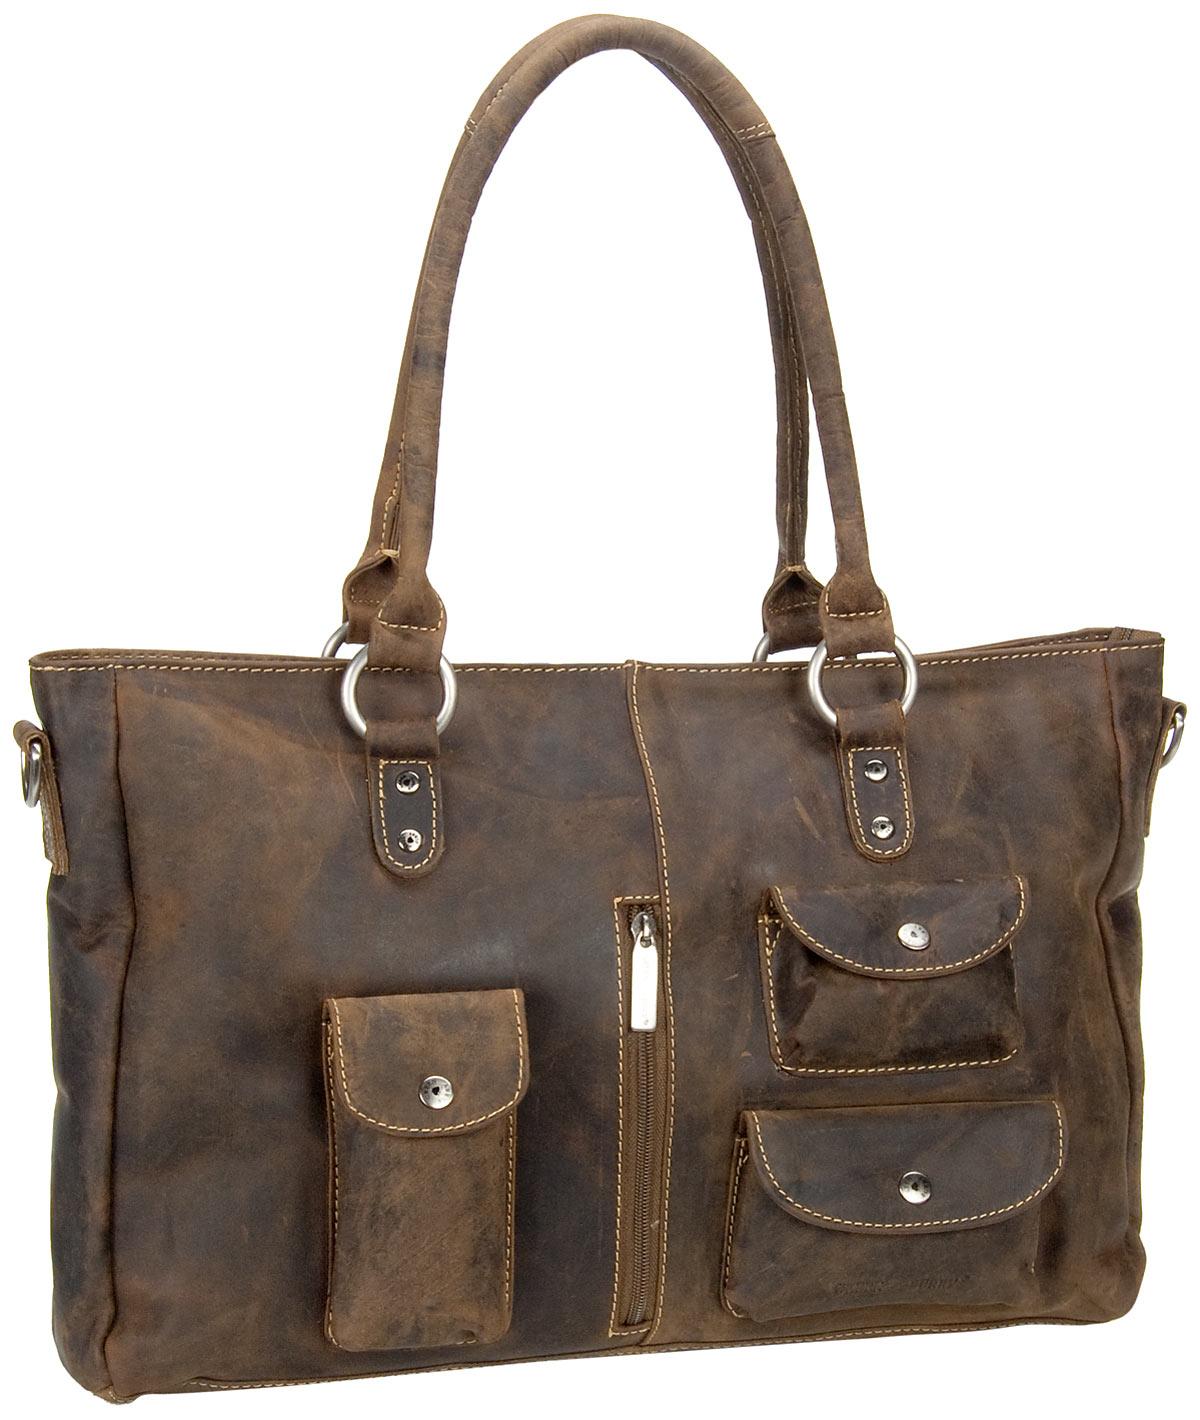 Handtasche Vintage Revival Vol.1 Shopper Sattelbraun